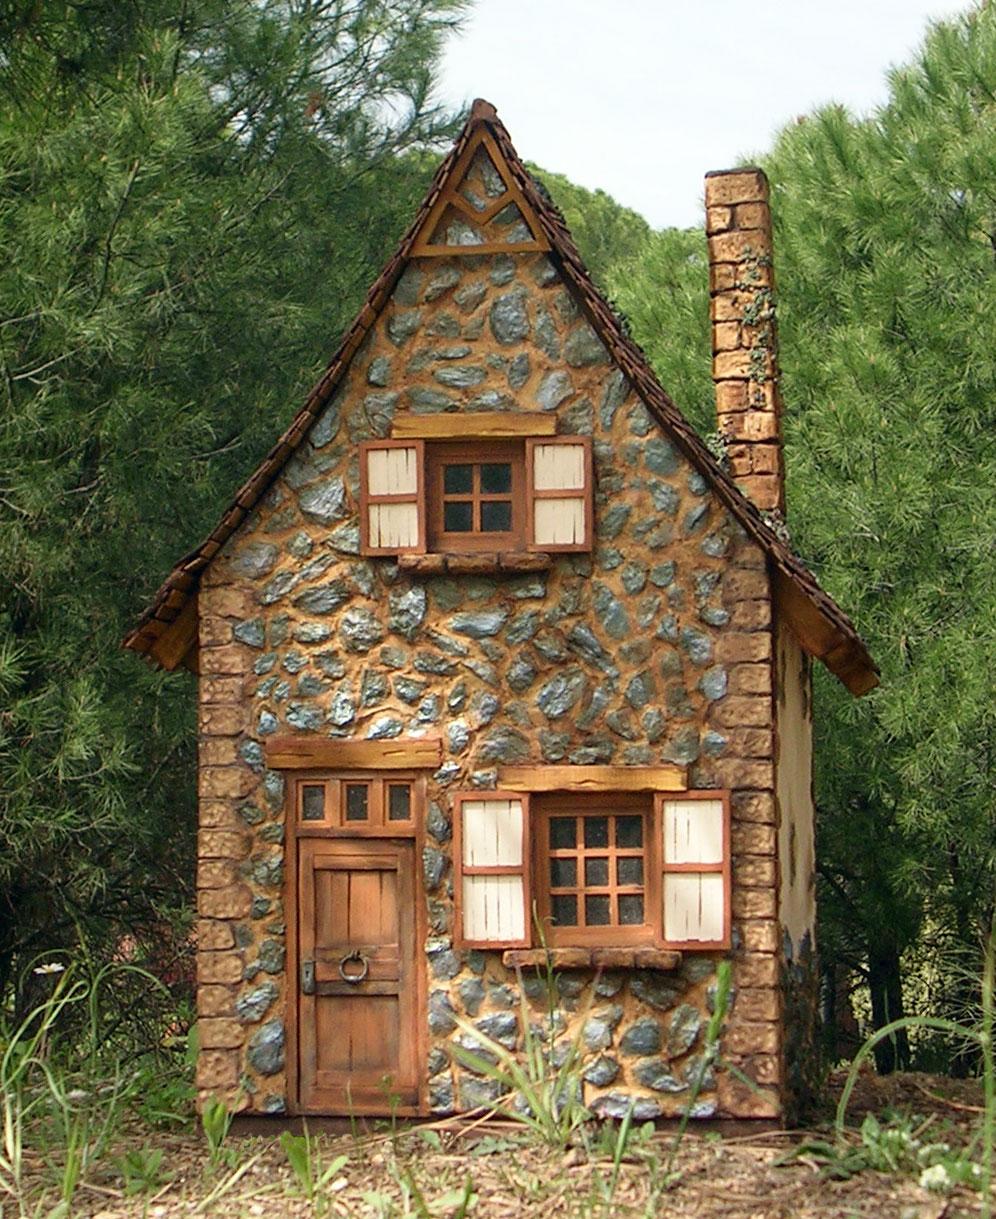 Miniaturas kriana la casa de la bruja n 6 salvaje de for How to build a stone cabin